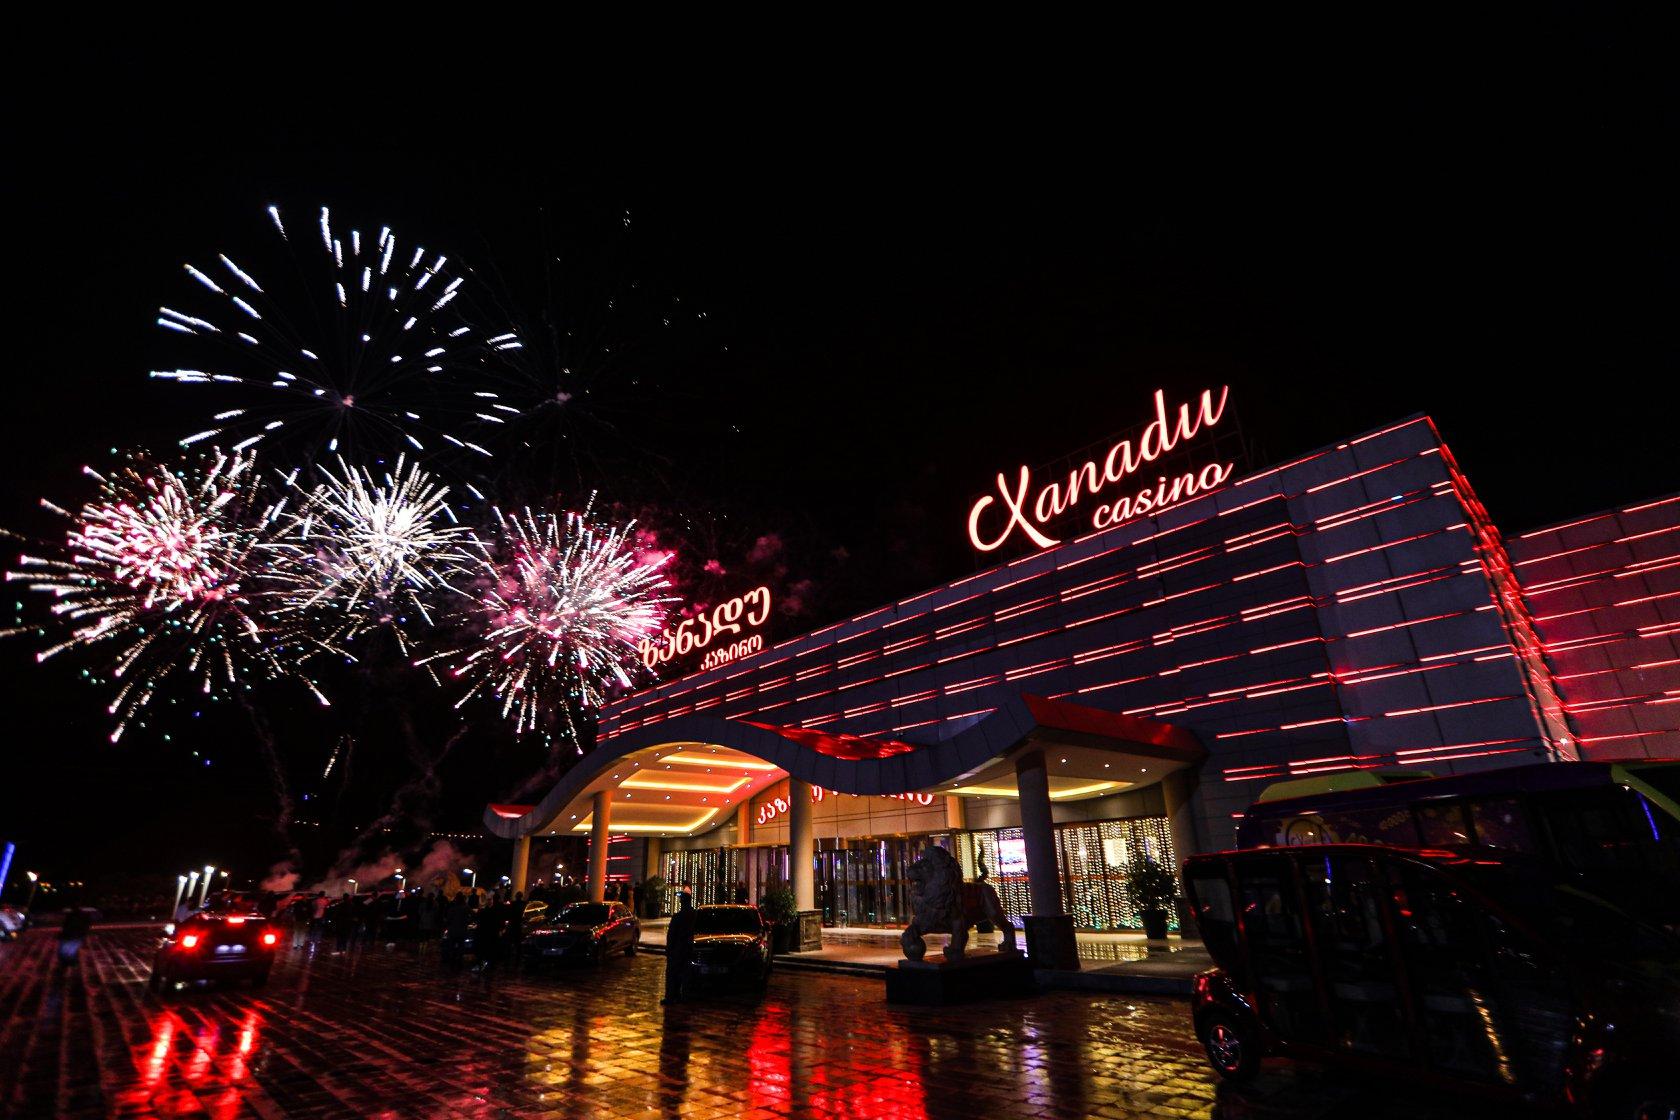 Xanadu Casino